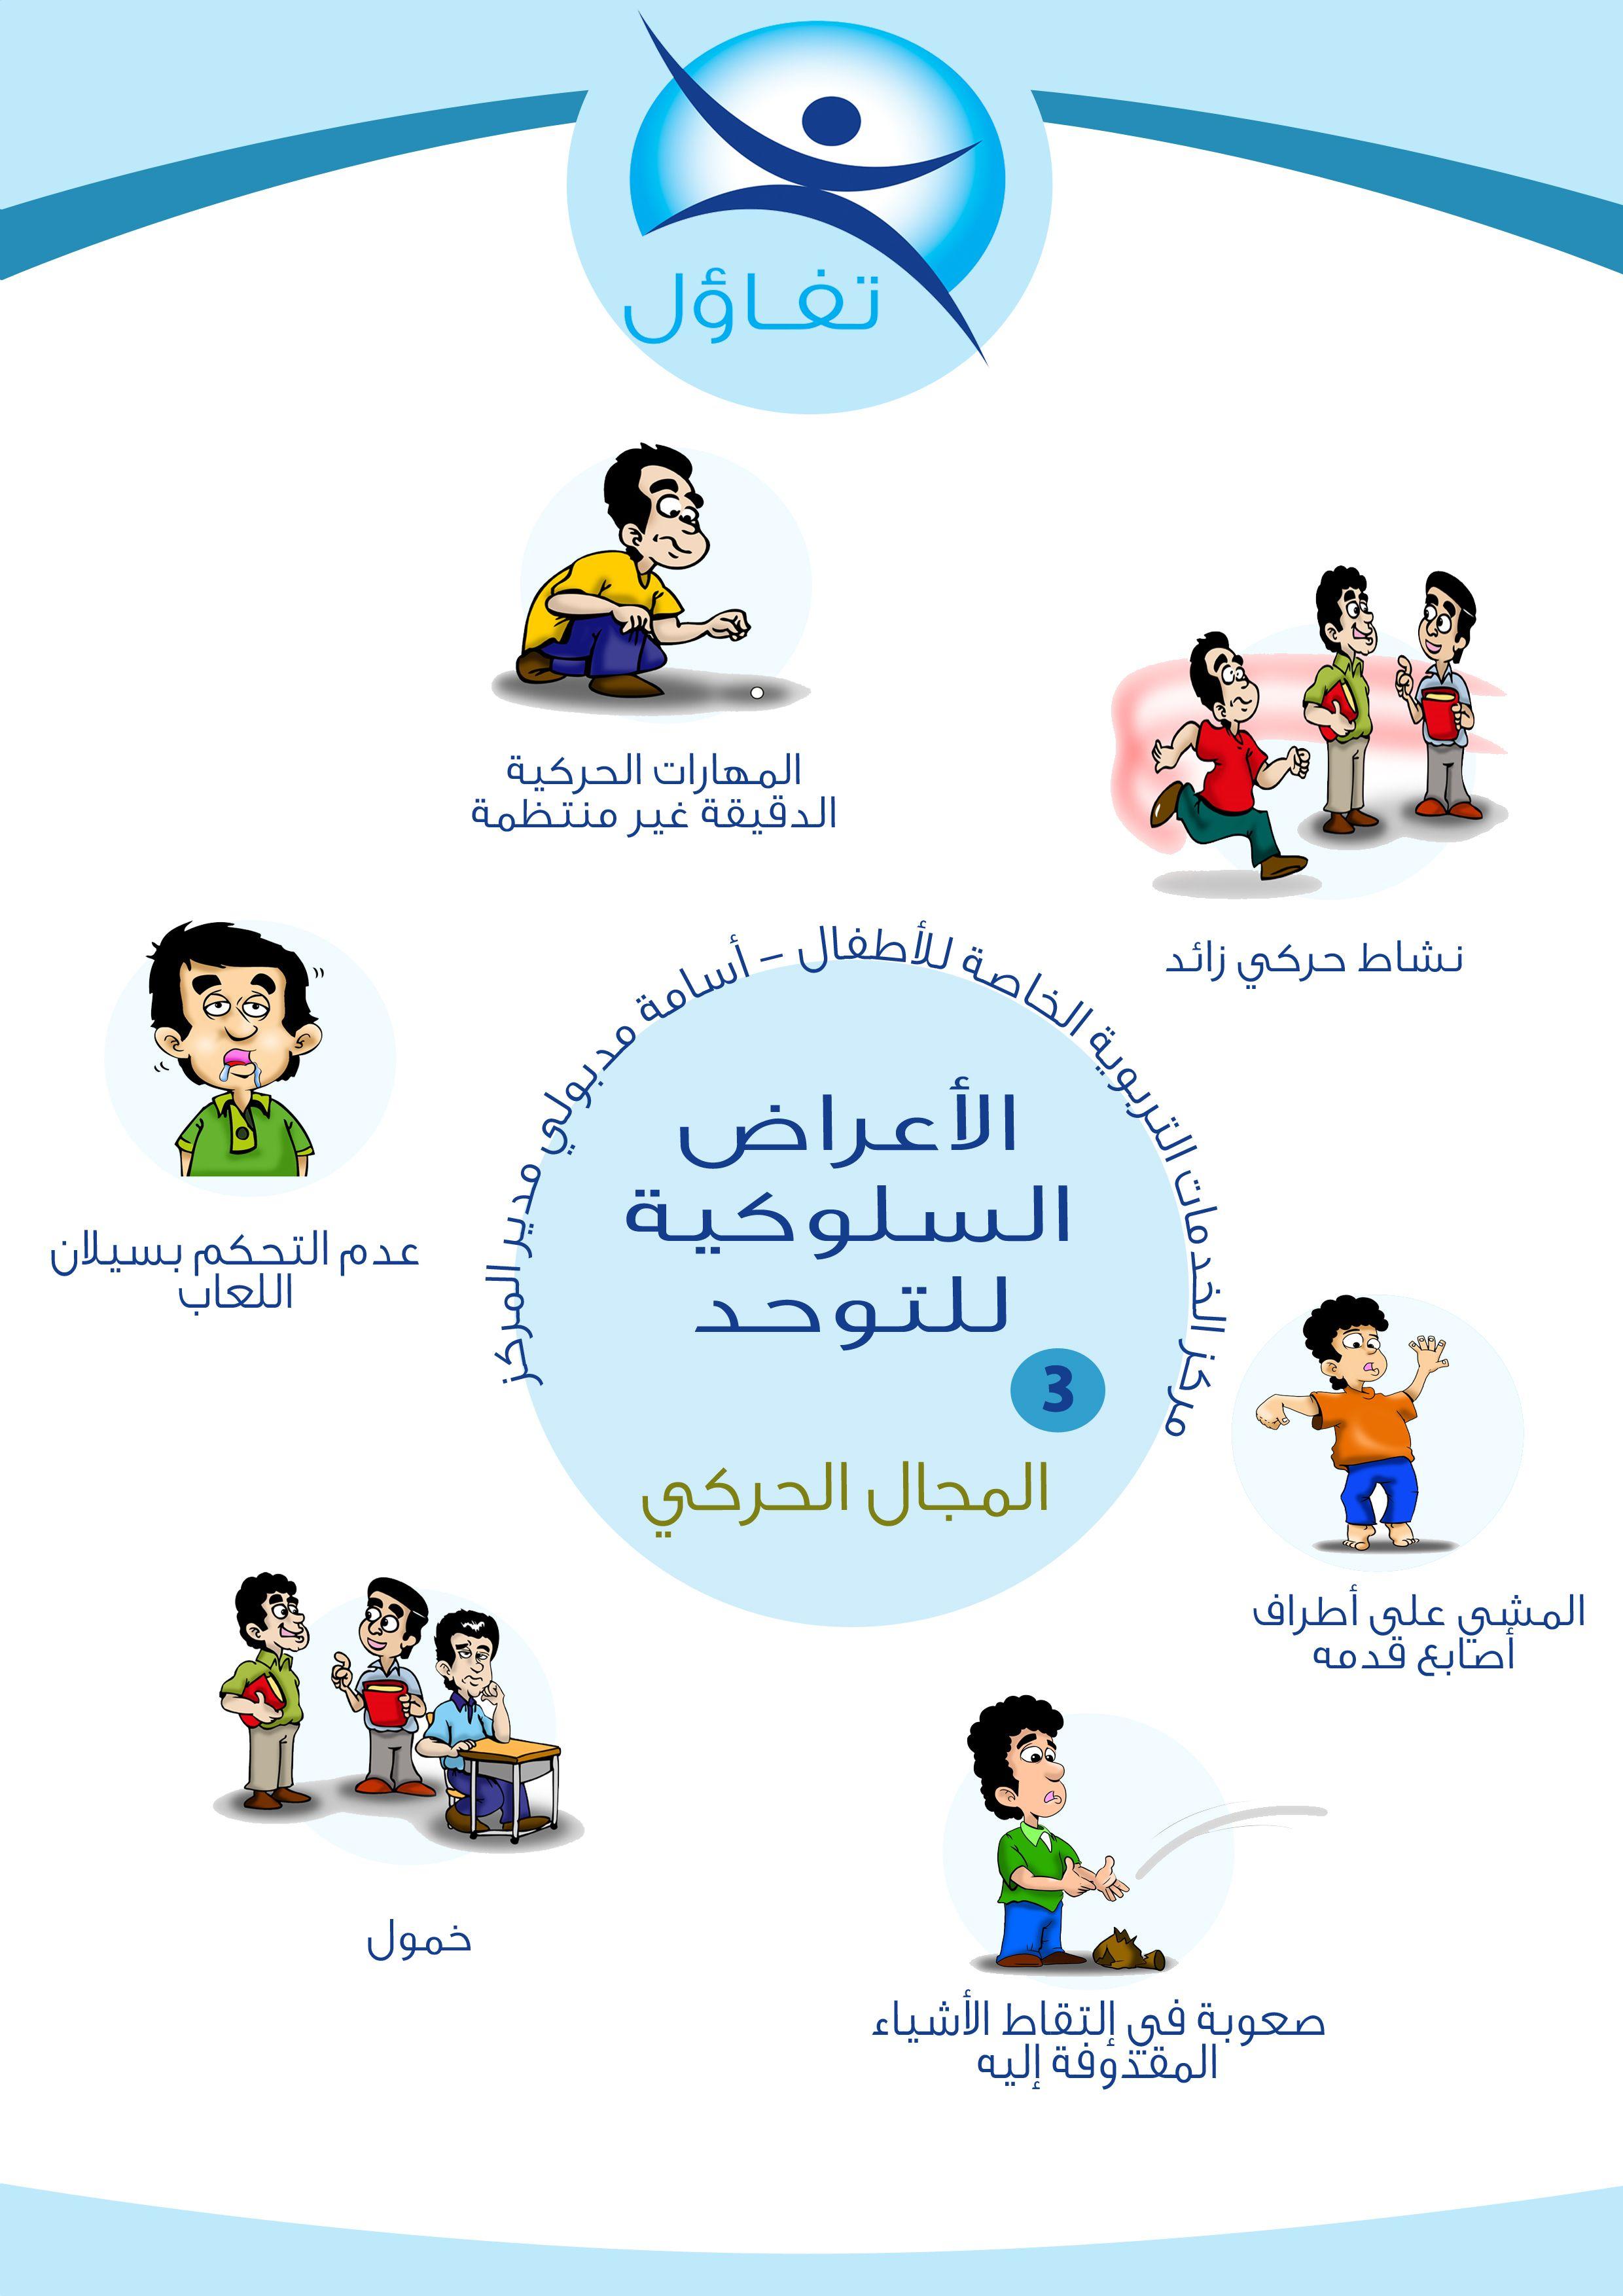 اعراض التوحد المجال الحركي Childrens Education Aspergers Autism Autism Spectrum Disorder